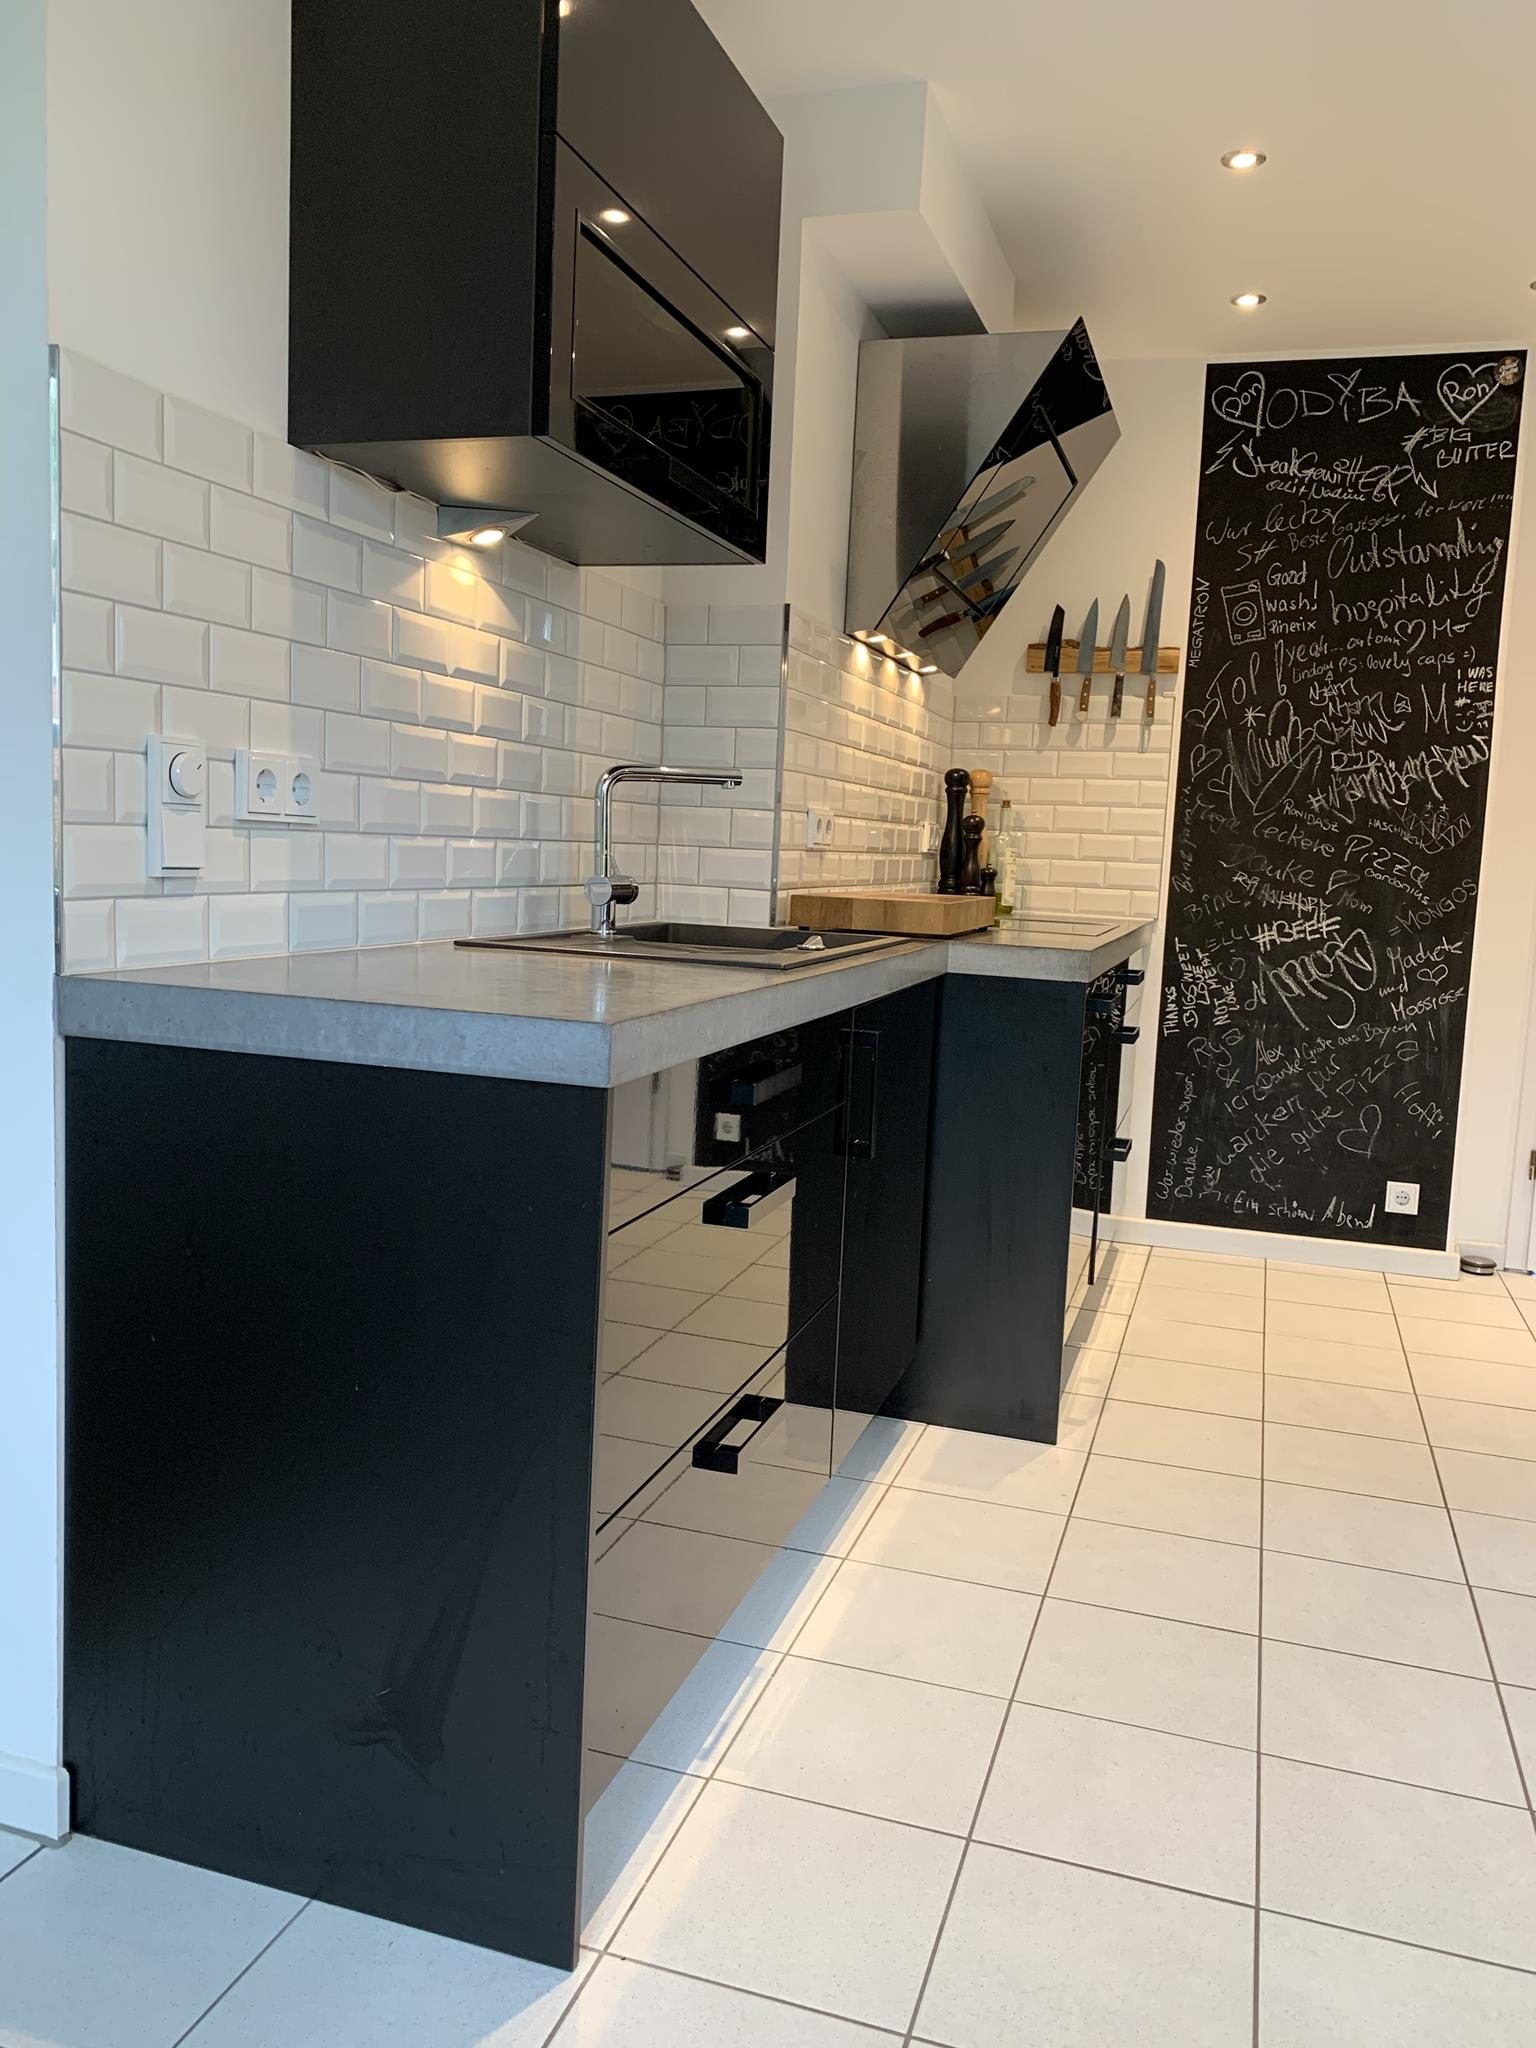 Arbeitsplatten aus Beton DIY - Anleitung mit Betonrezept ...